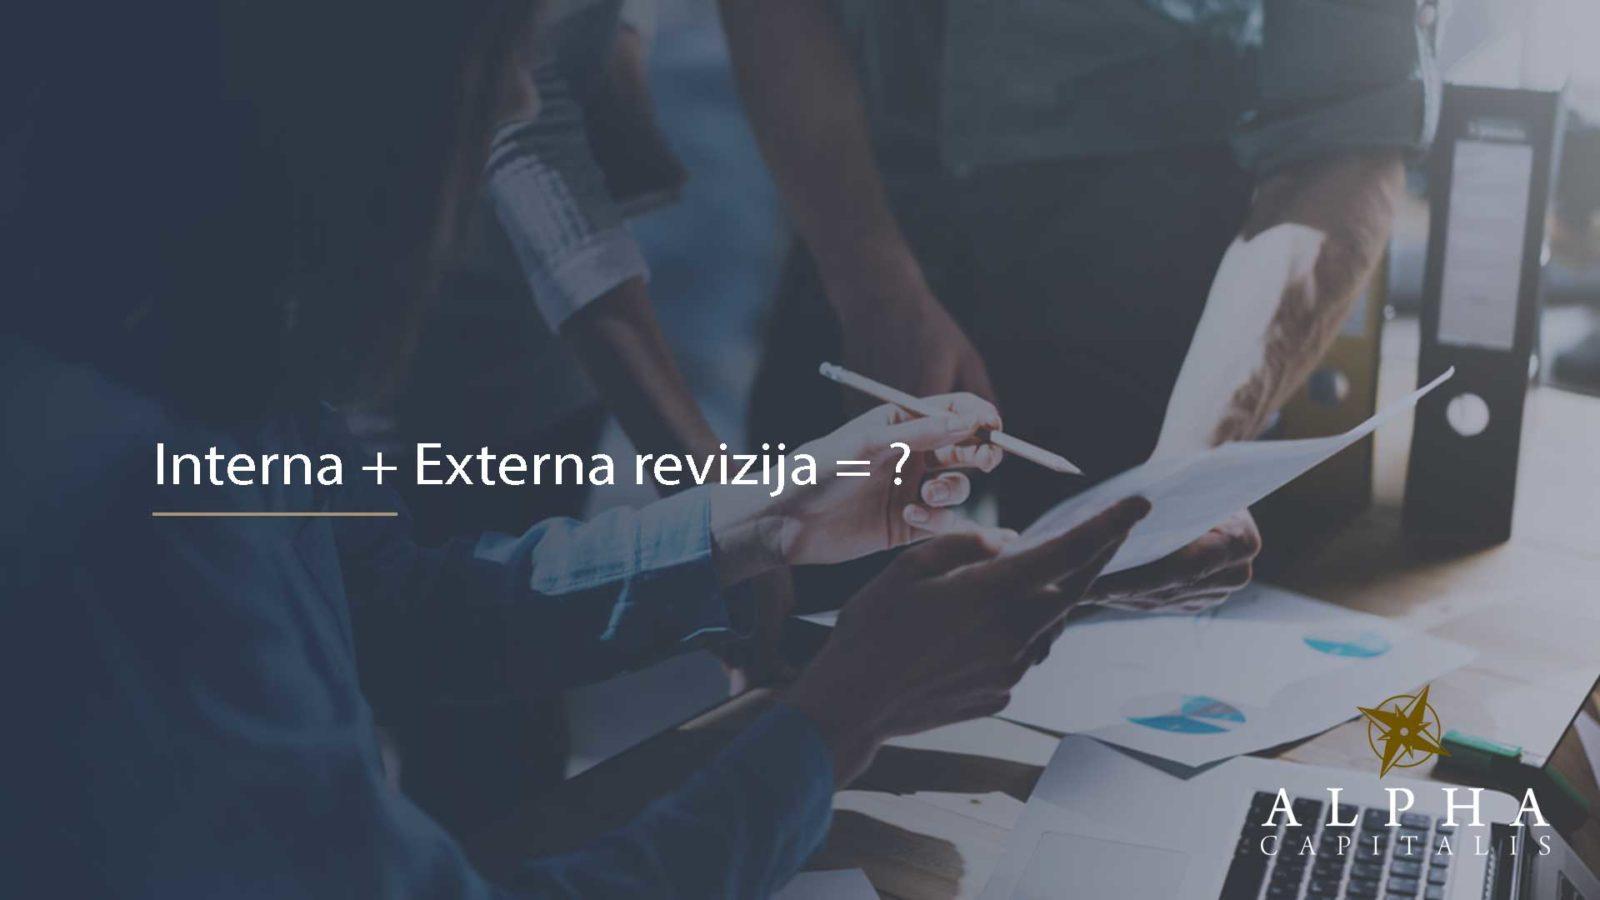 Interna i externa revizija 2019 02 09 - Suradnja interne i eksterne revizije